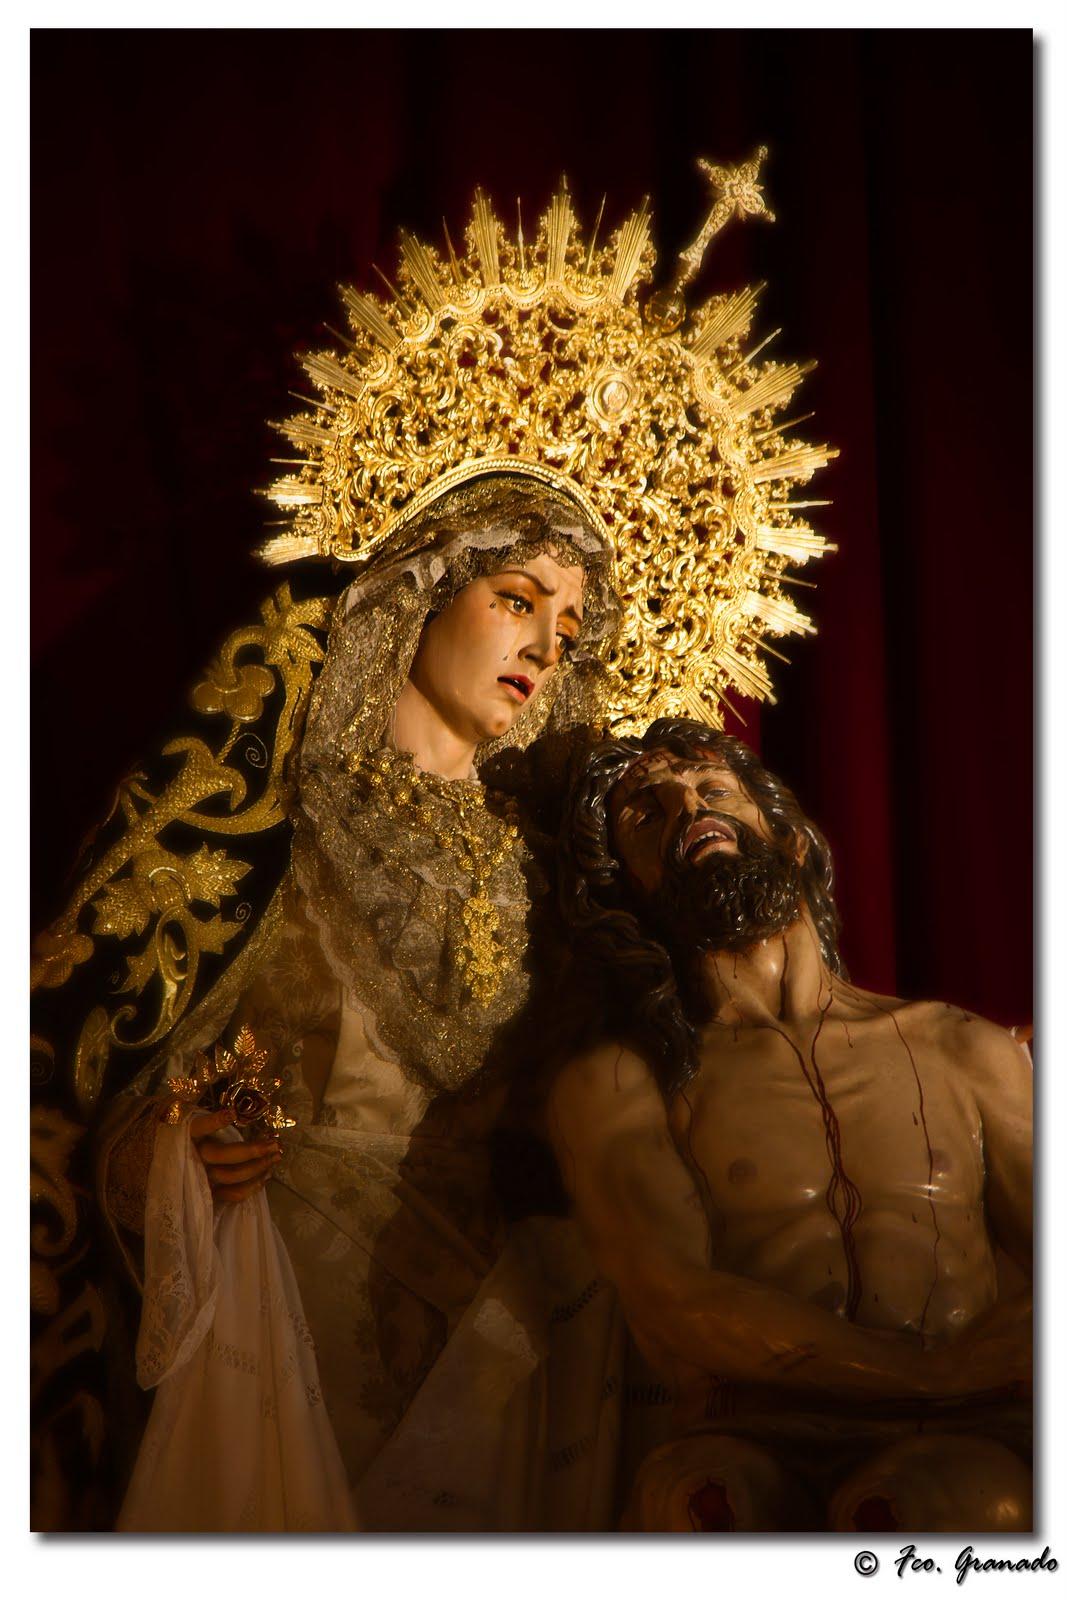 http://franciscogranadopatero35.blogspot.com.es/2011/03/quinario-hermandad-de-la-vera-cruz-de.html